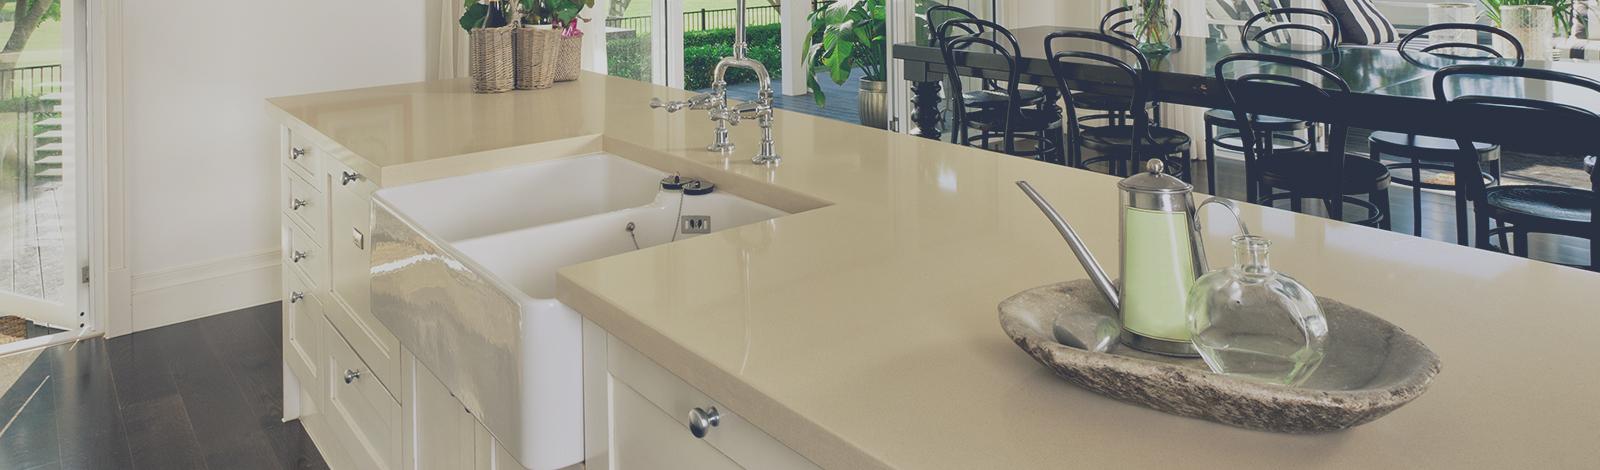 Quartz Kitchen And Bathroom Countertops Fabrique Plus